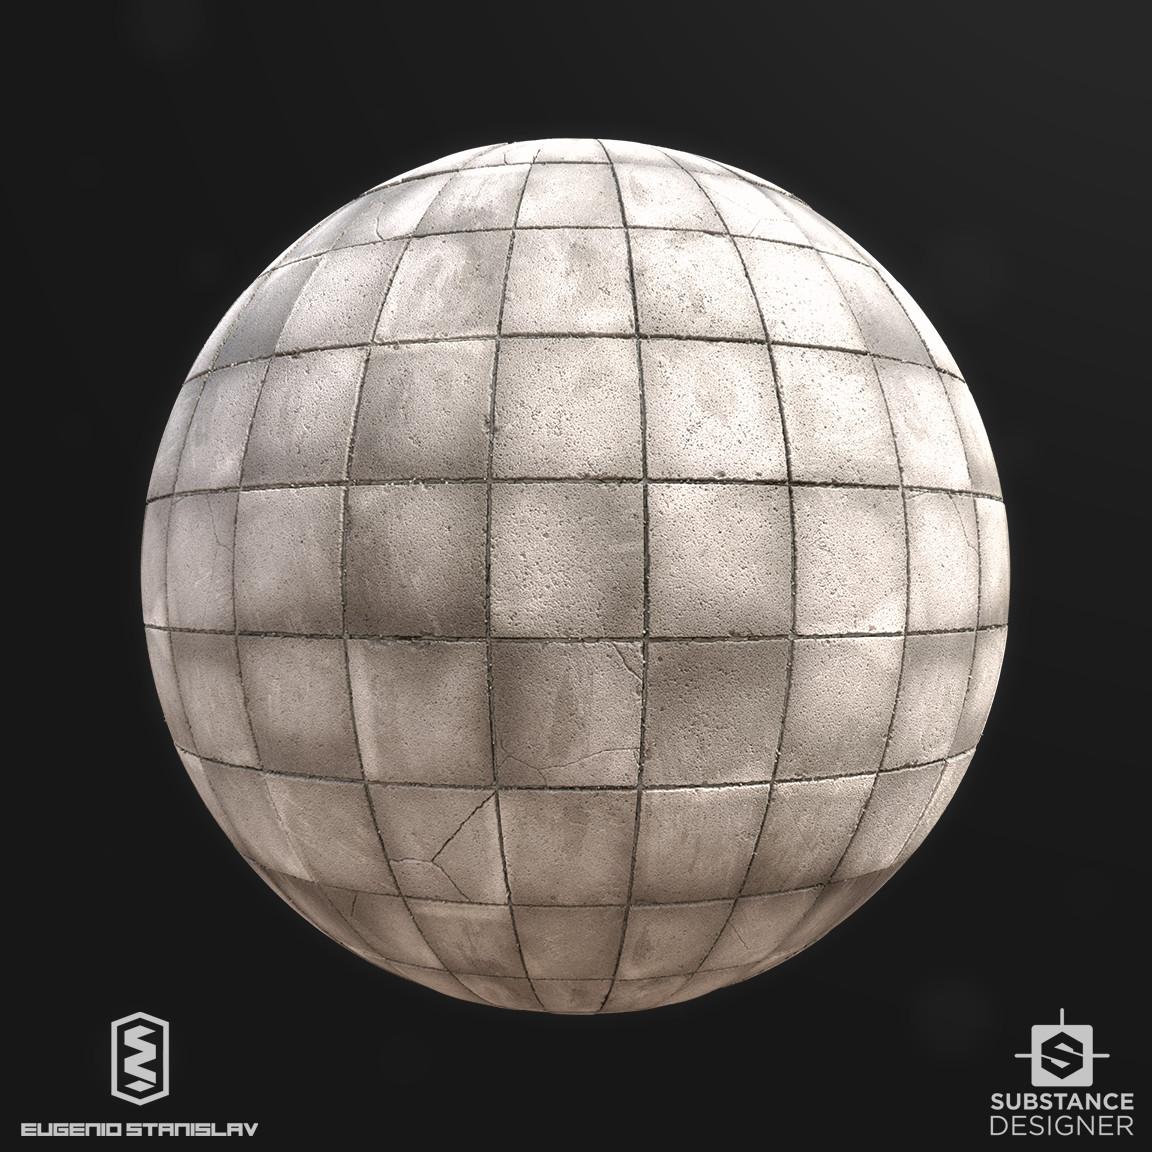 Eugenio stanislav concrete plain tile ball s